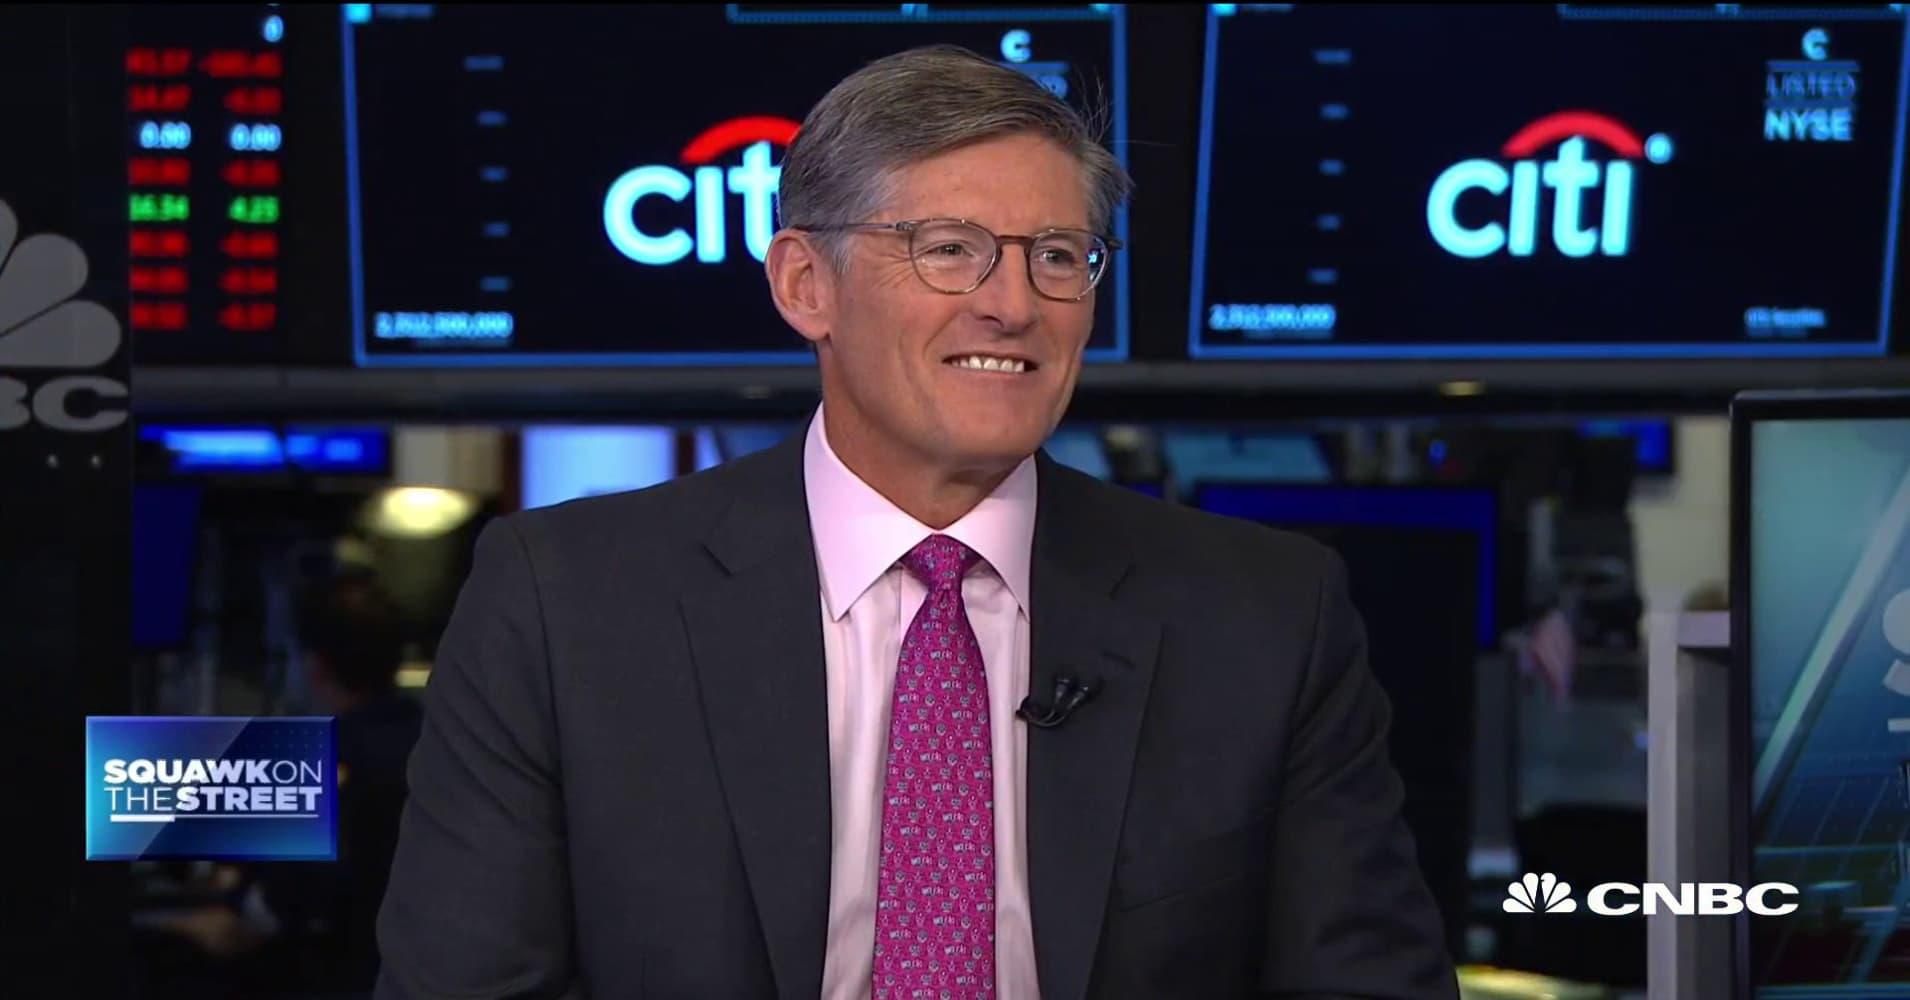 Citigroup CEO defends Brazil event amid anti-LGBT controversy